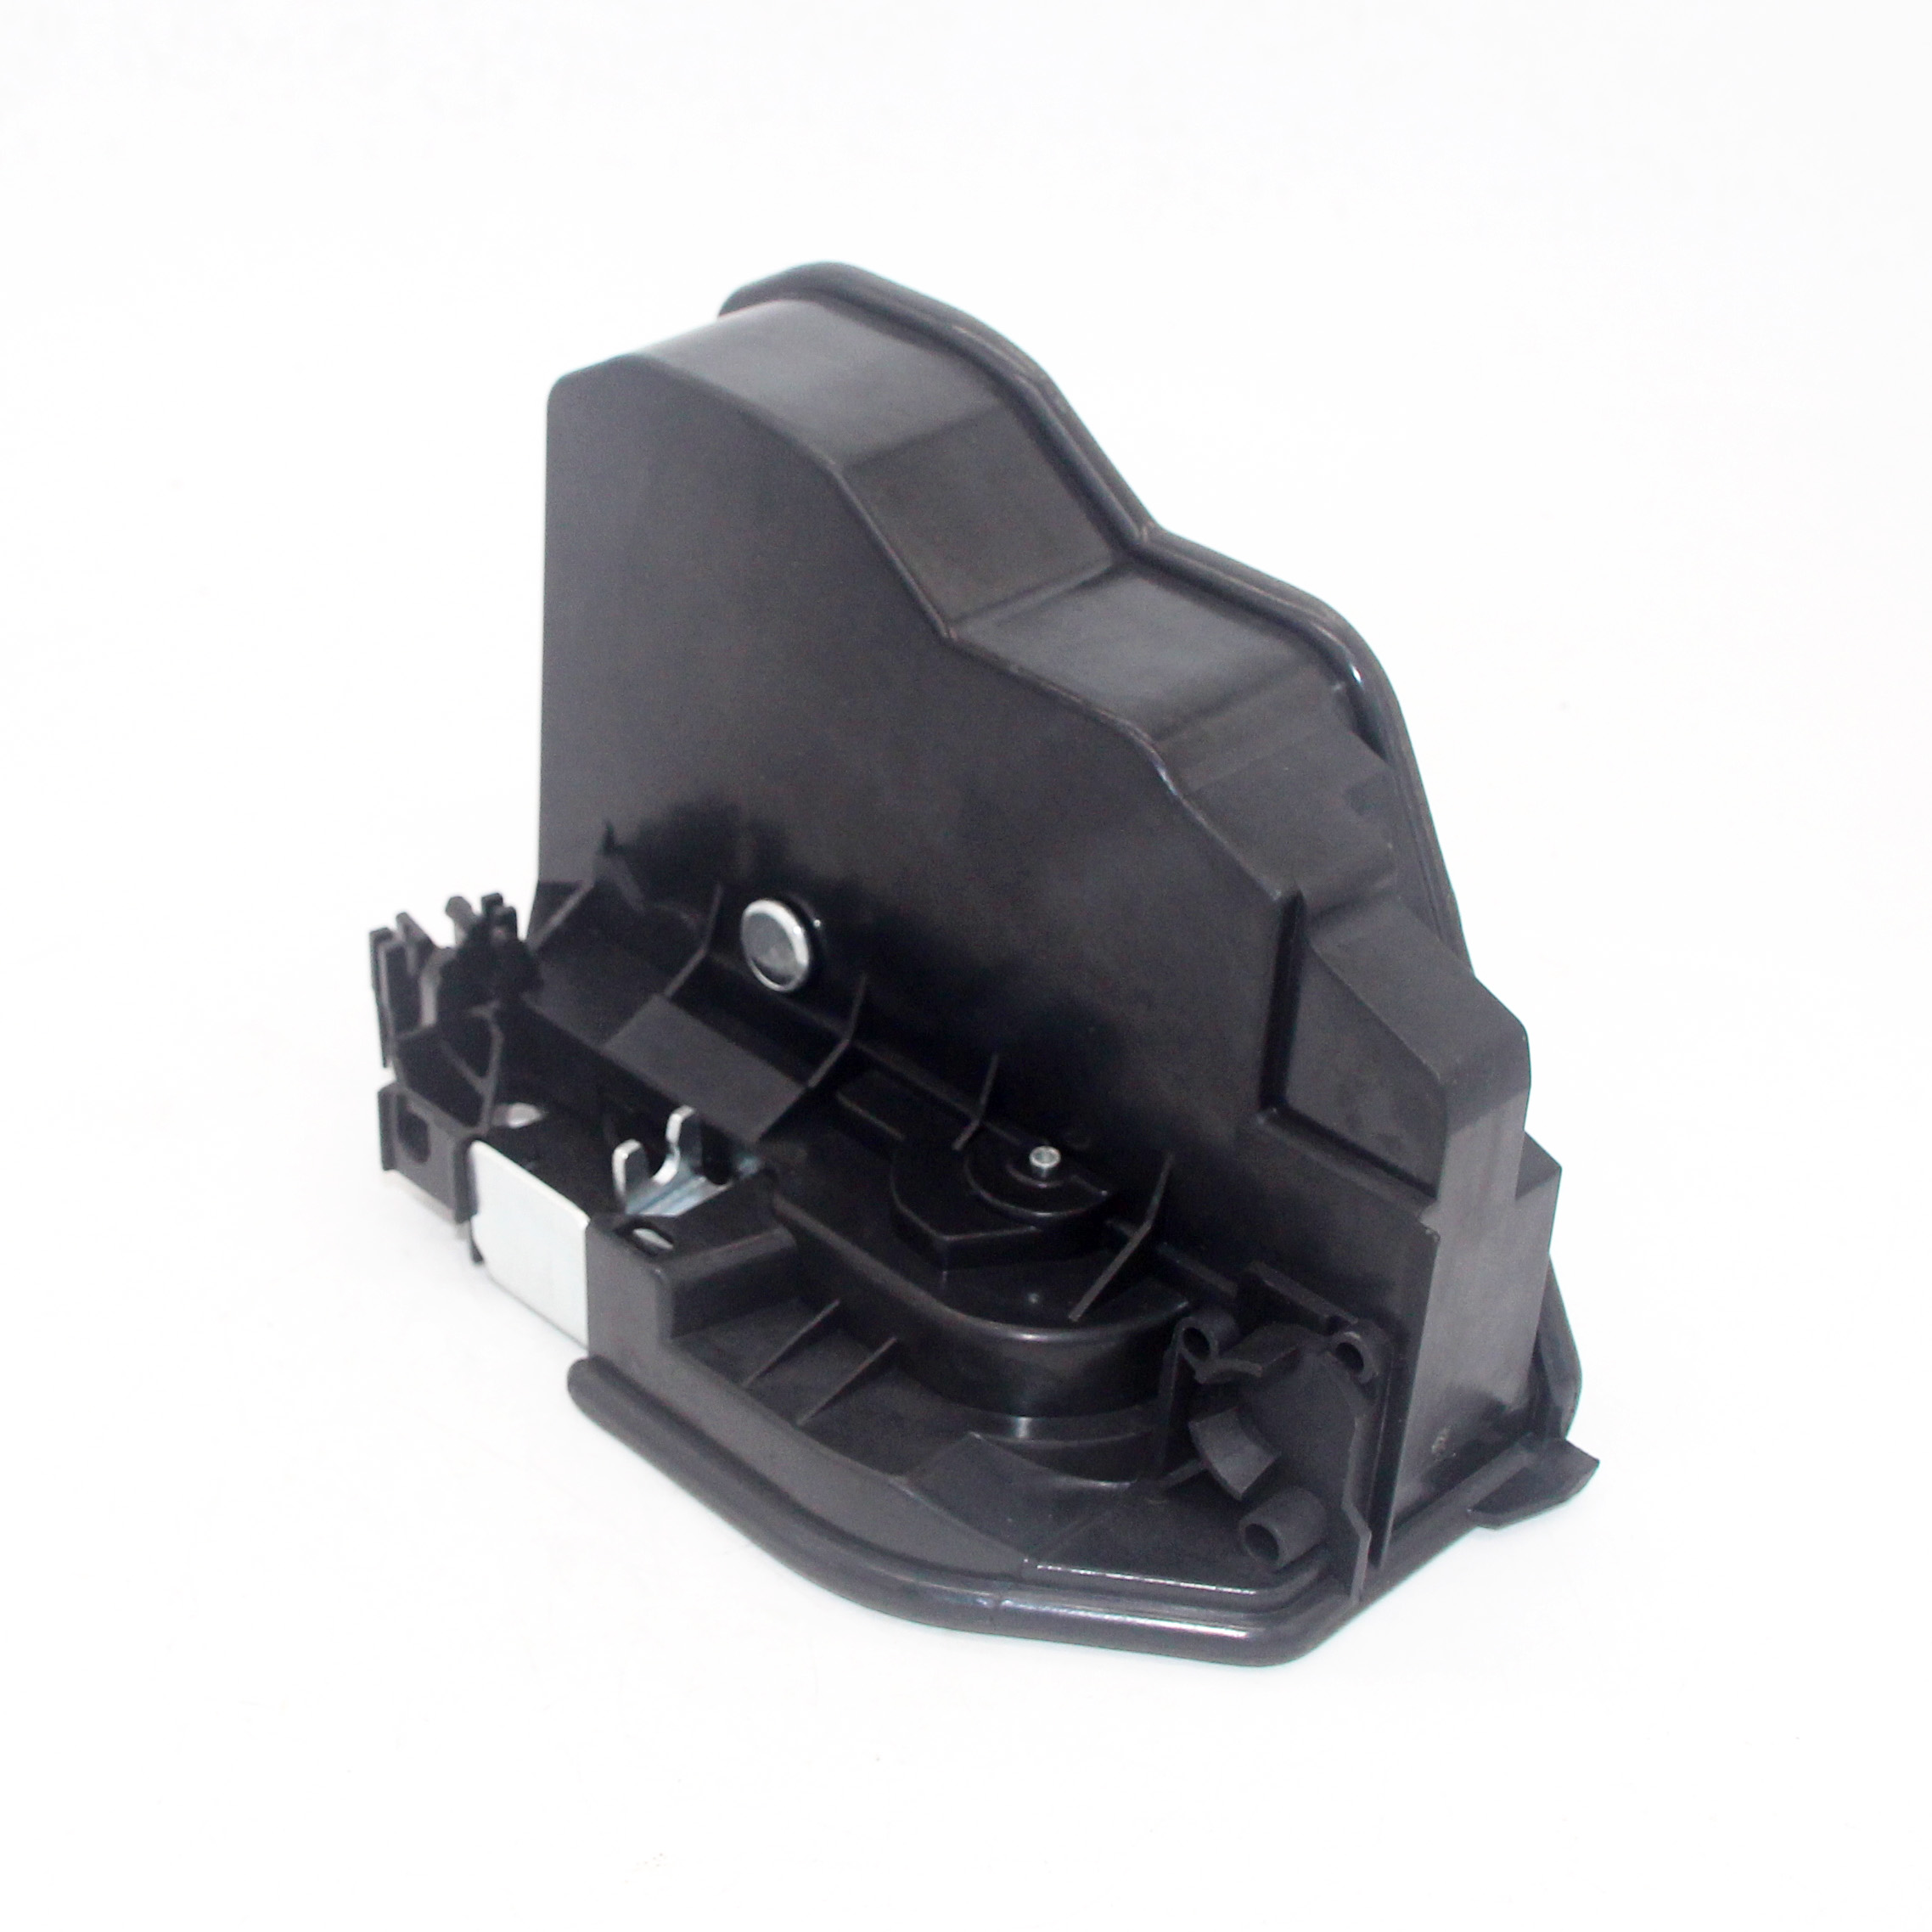 REAR LEFT DOOR LATCH LOCK ACTUATOR For BMW X6 E60 E70 E90 MINI Cooper Vehicles